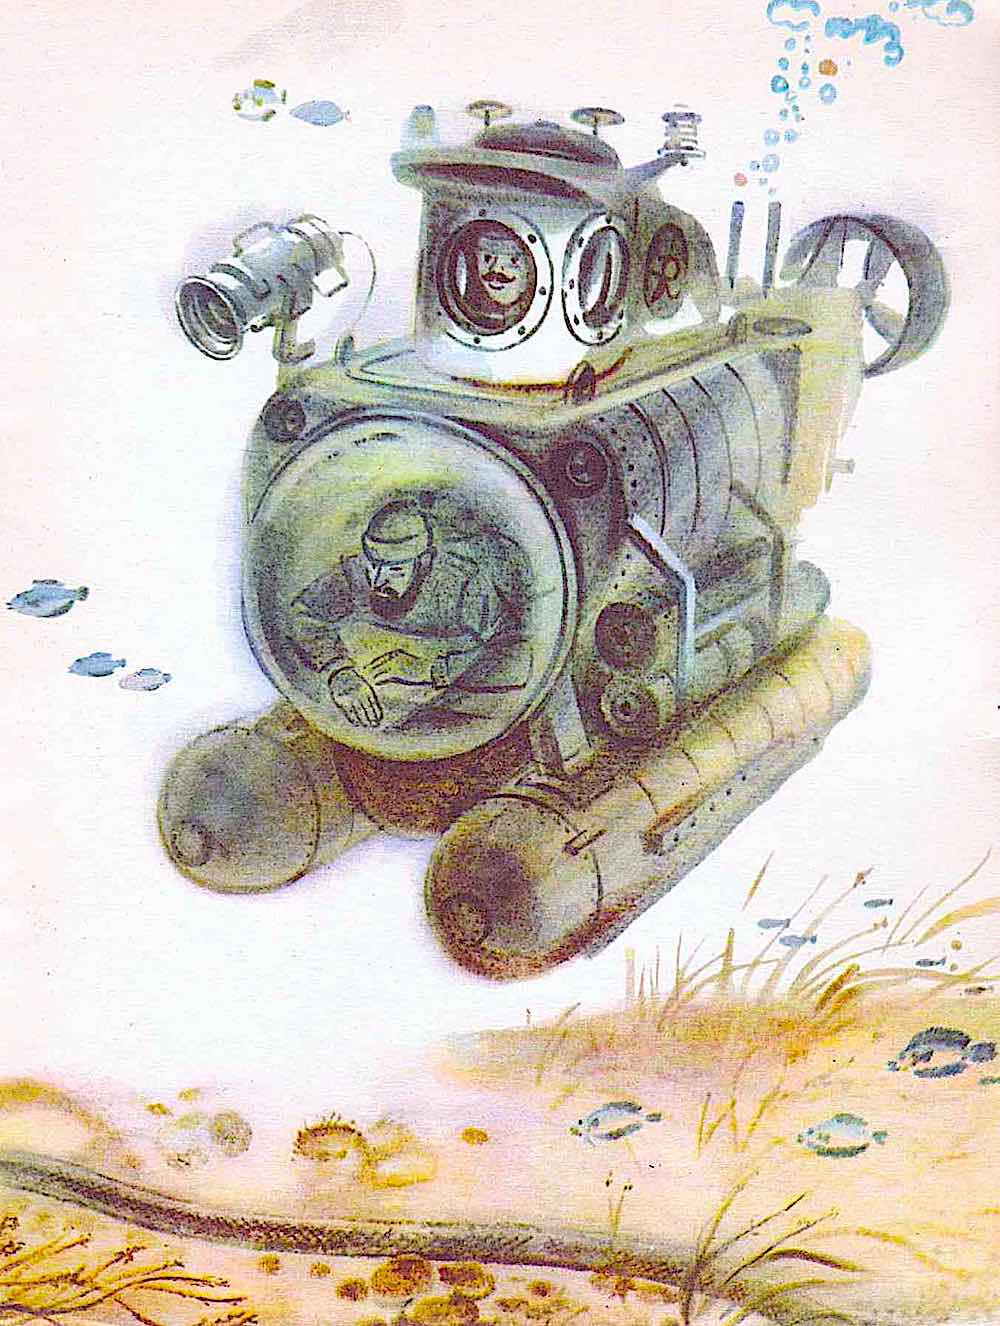 a Russian children's book illustration 1960s? Men in a small submarine